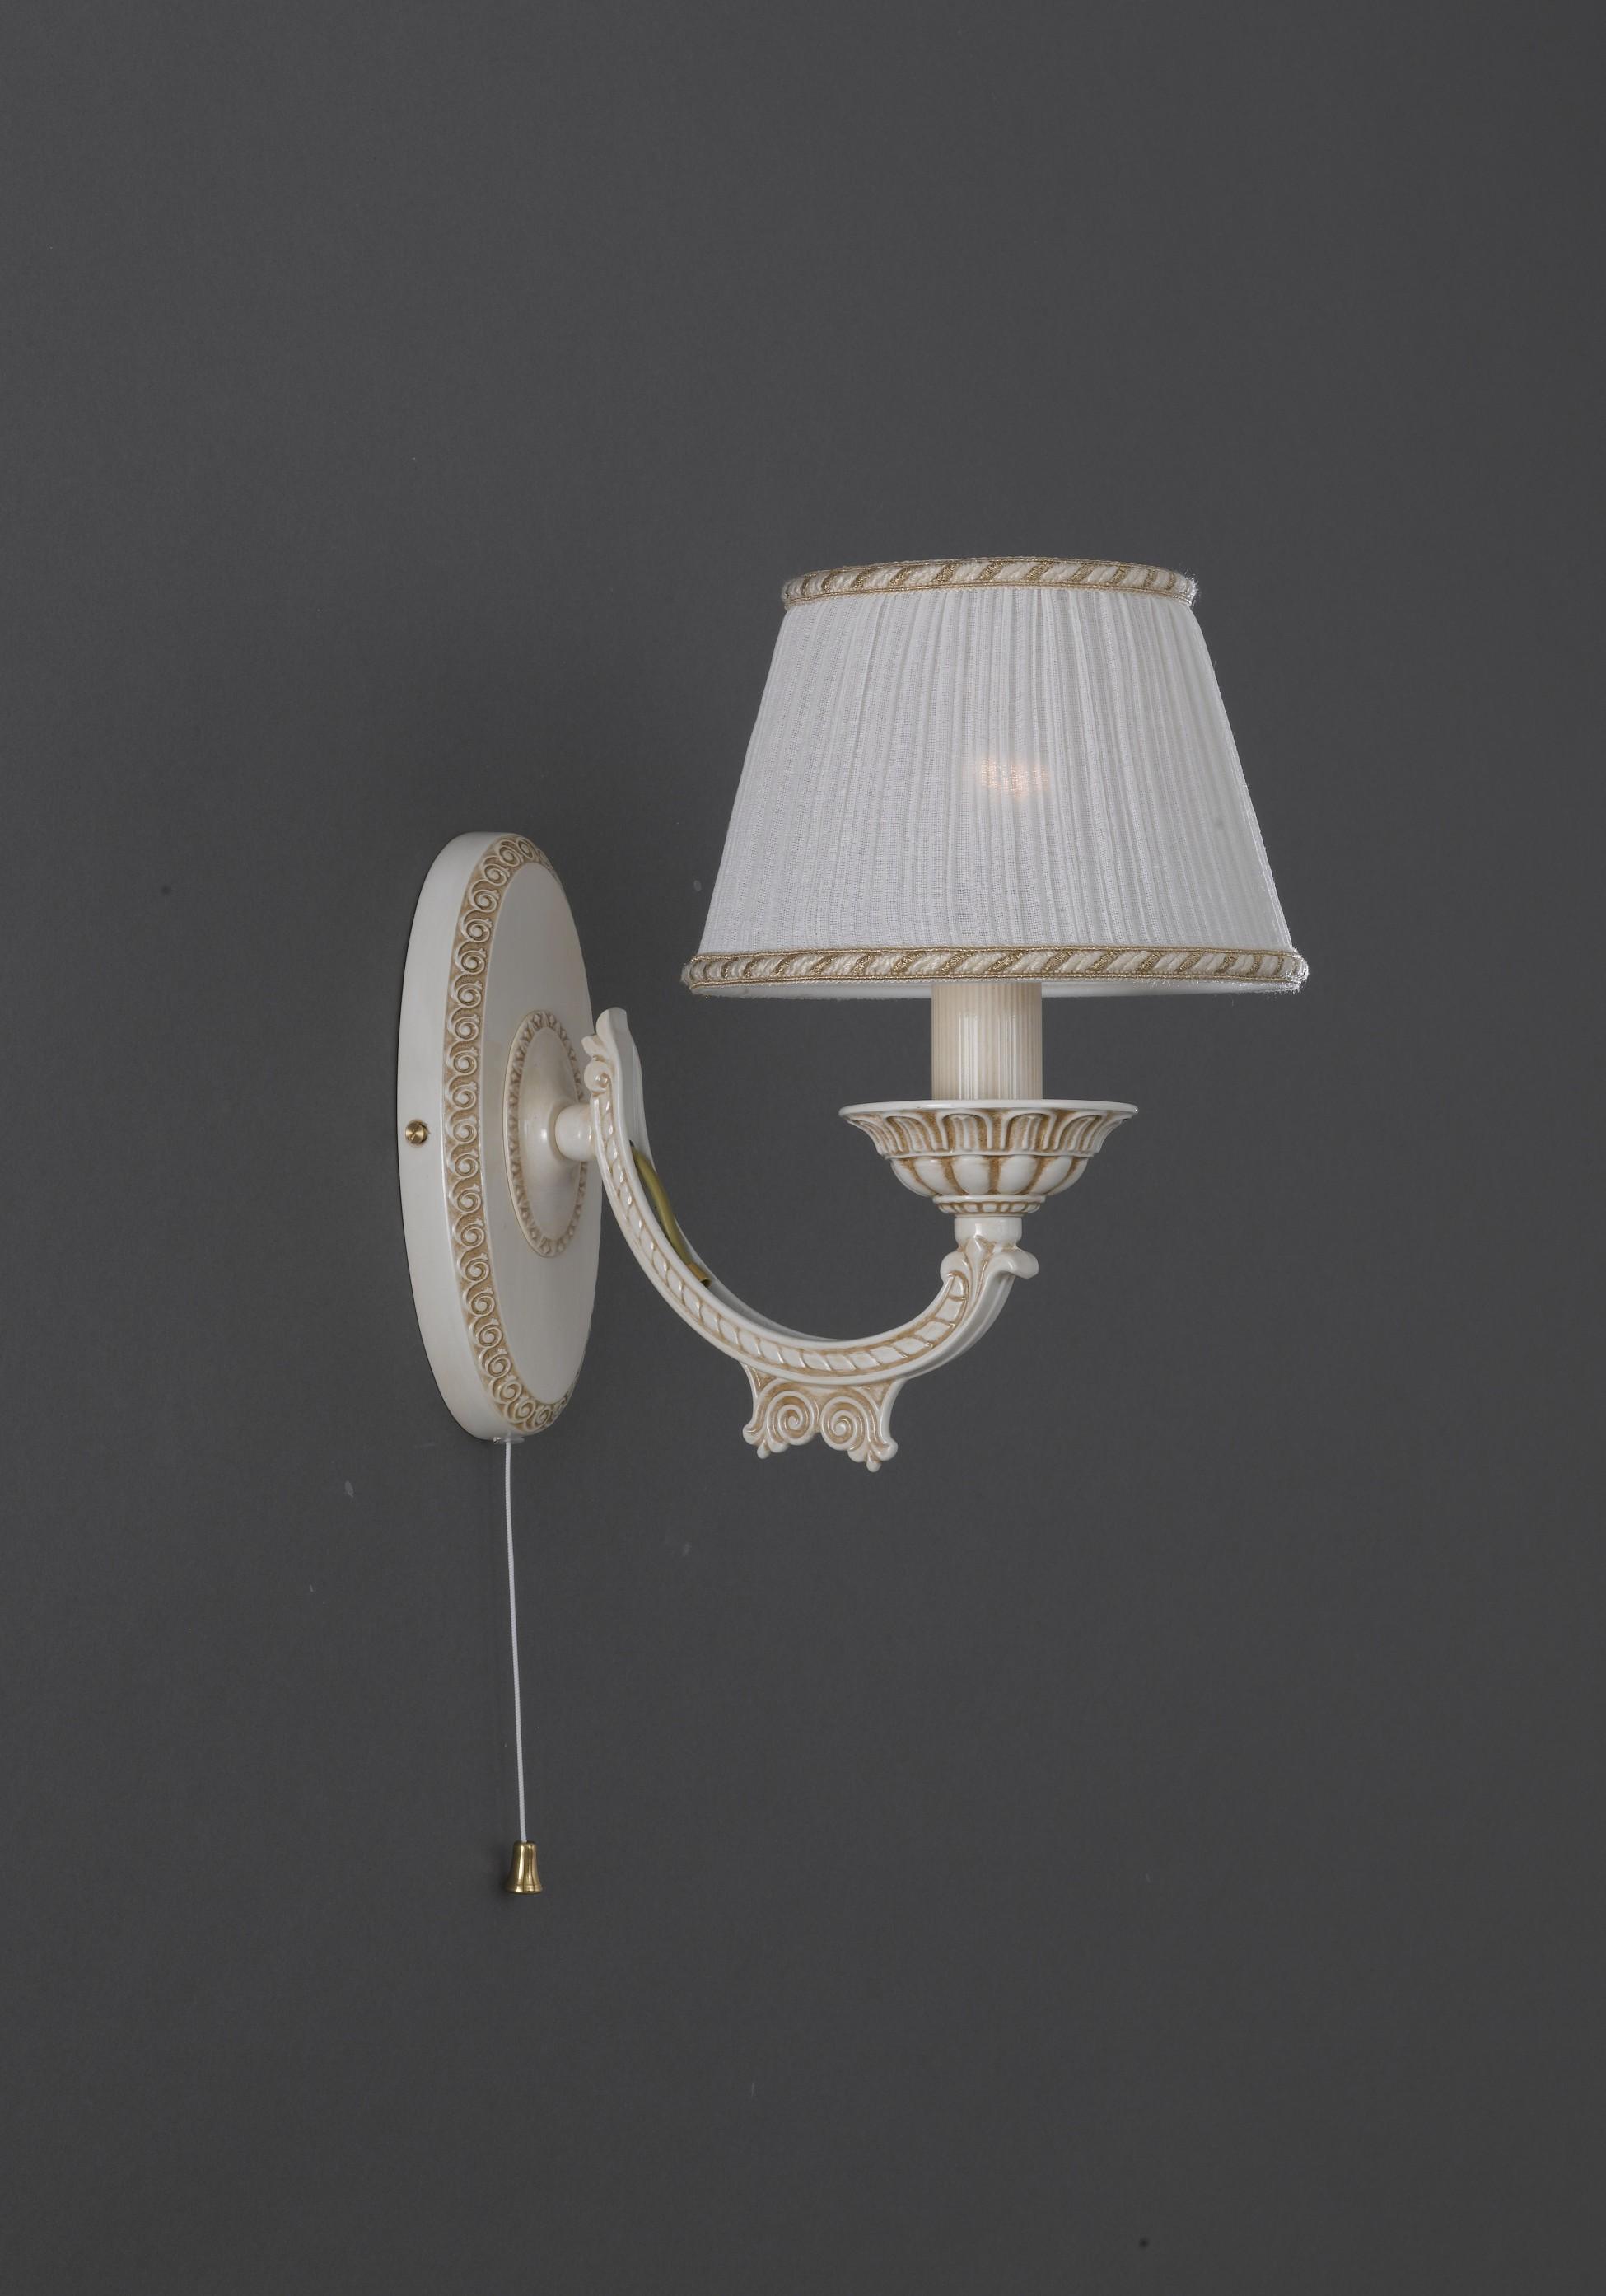 klassische wandlampe aus antik weiss messing mit. Black Bedroom Furniture Sets. Home Design Ideas